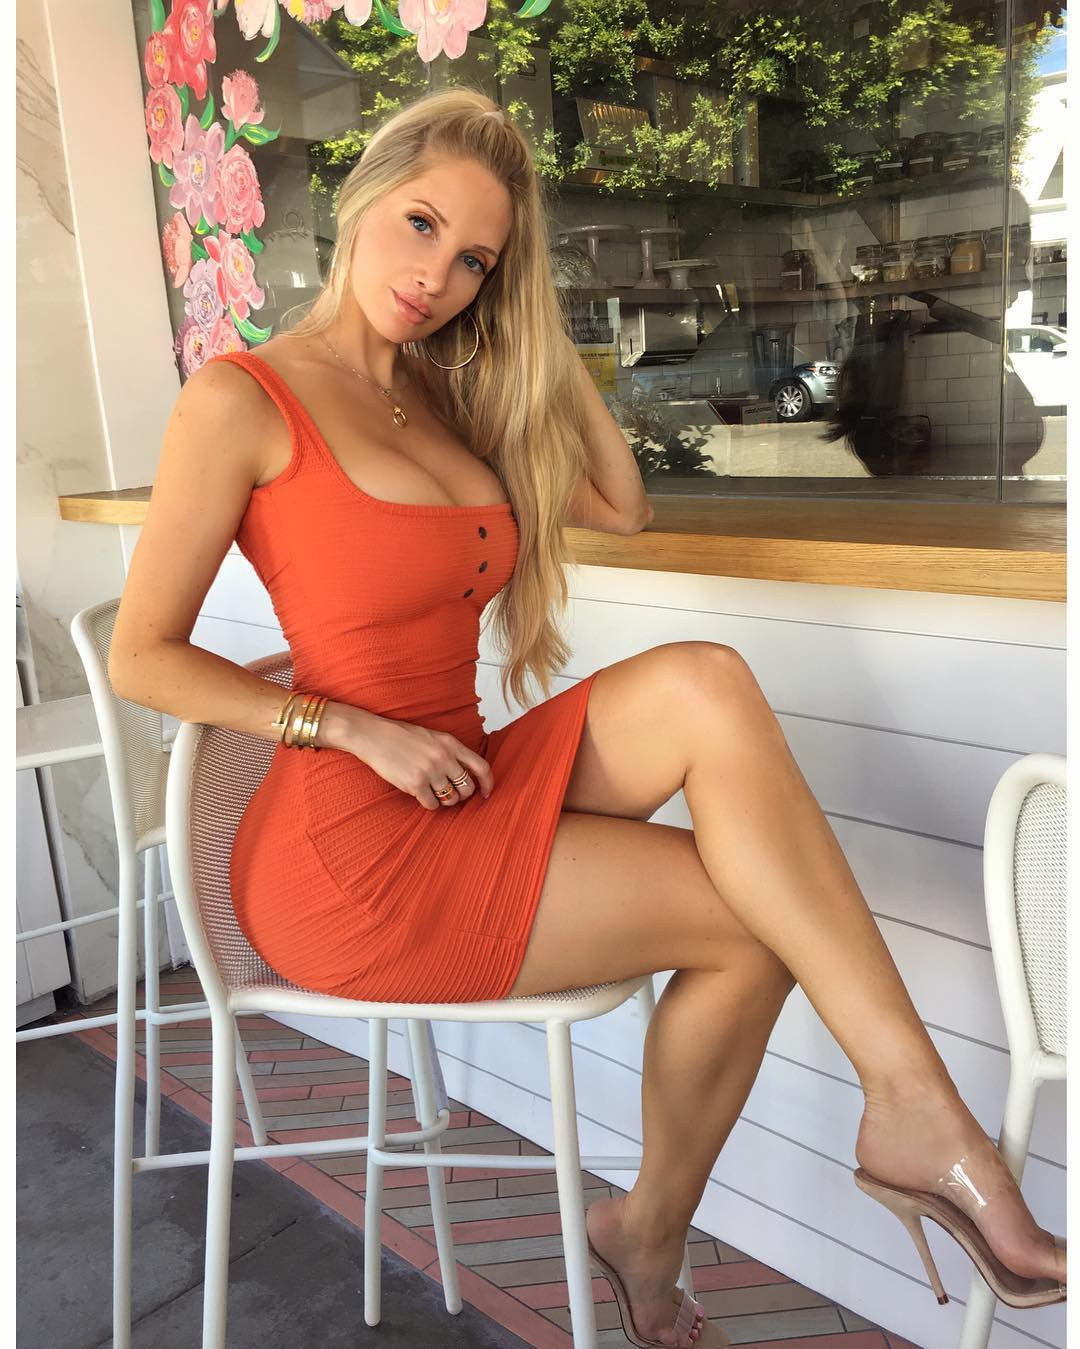 Well liked amanda lee legs, Christie Brinkley